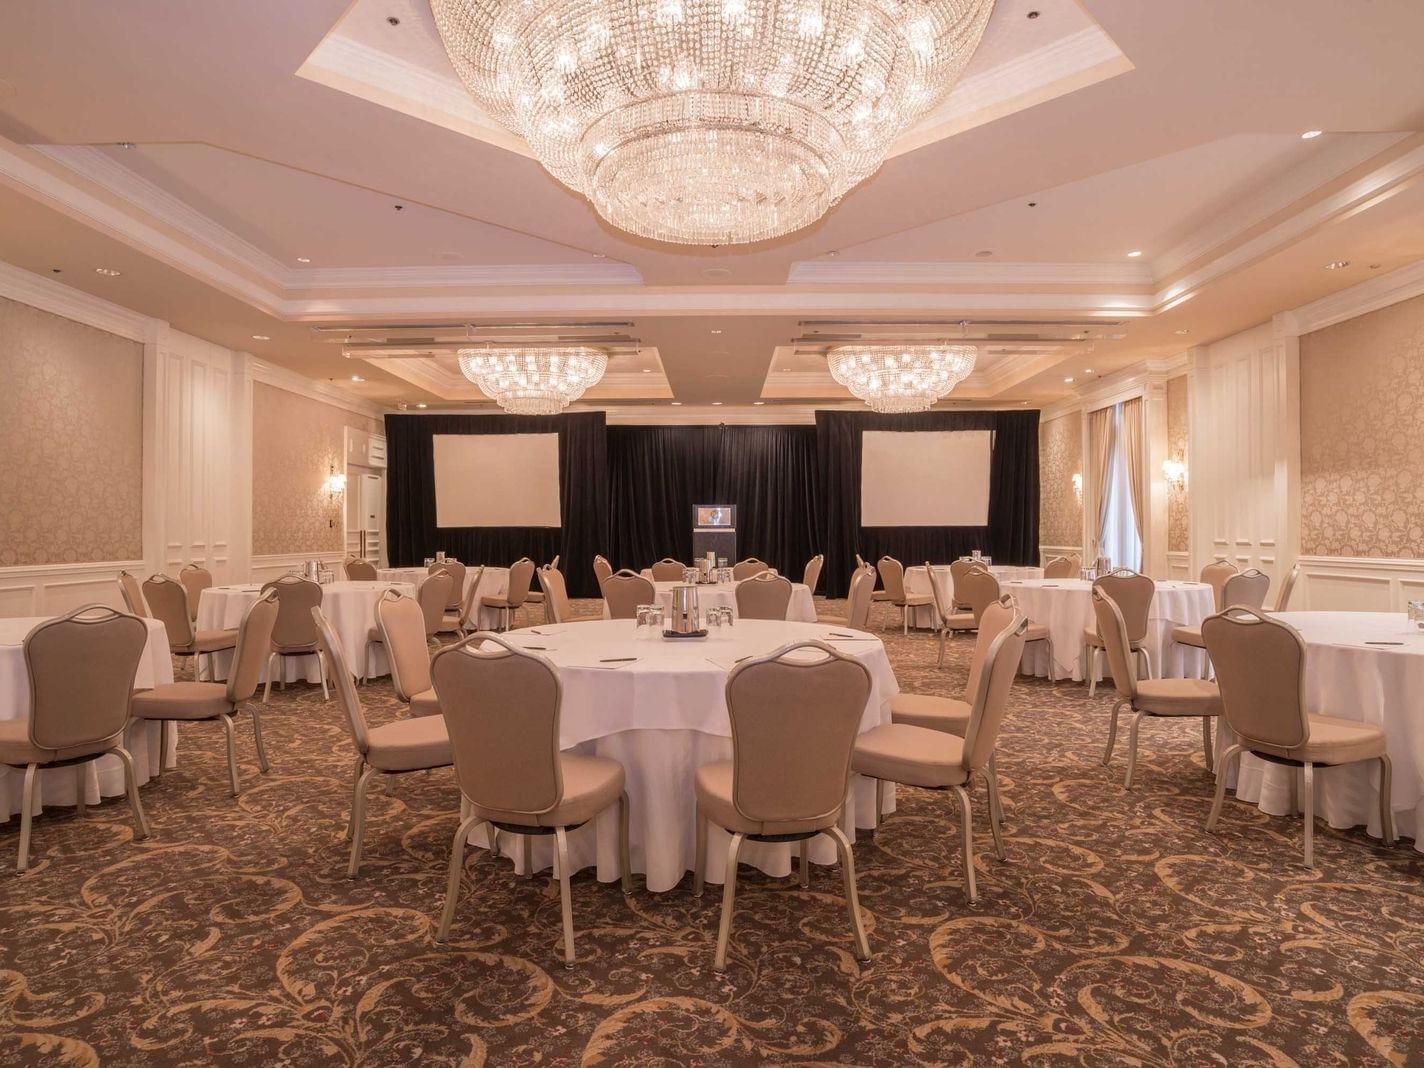 Le Versailles Ballroom (A & B) The Sutton Place Hotels